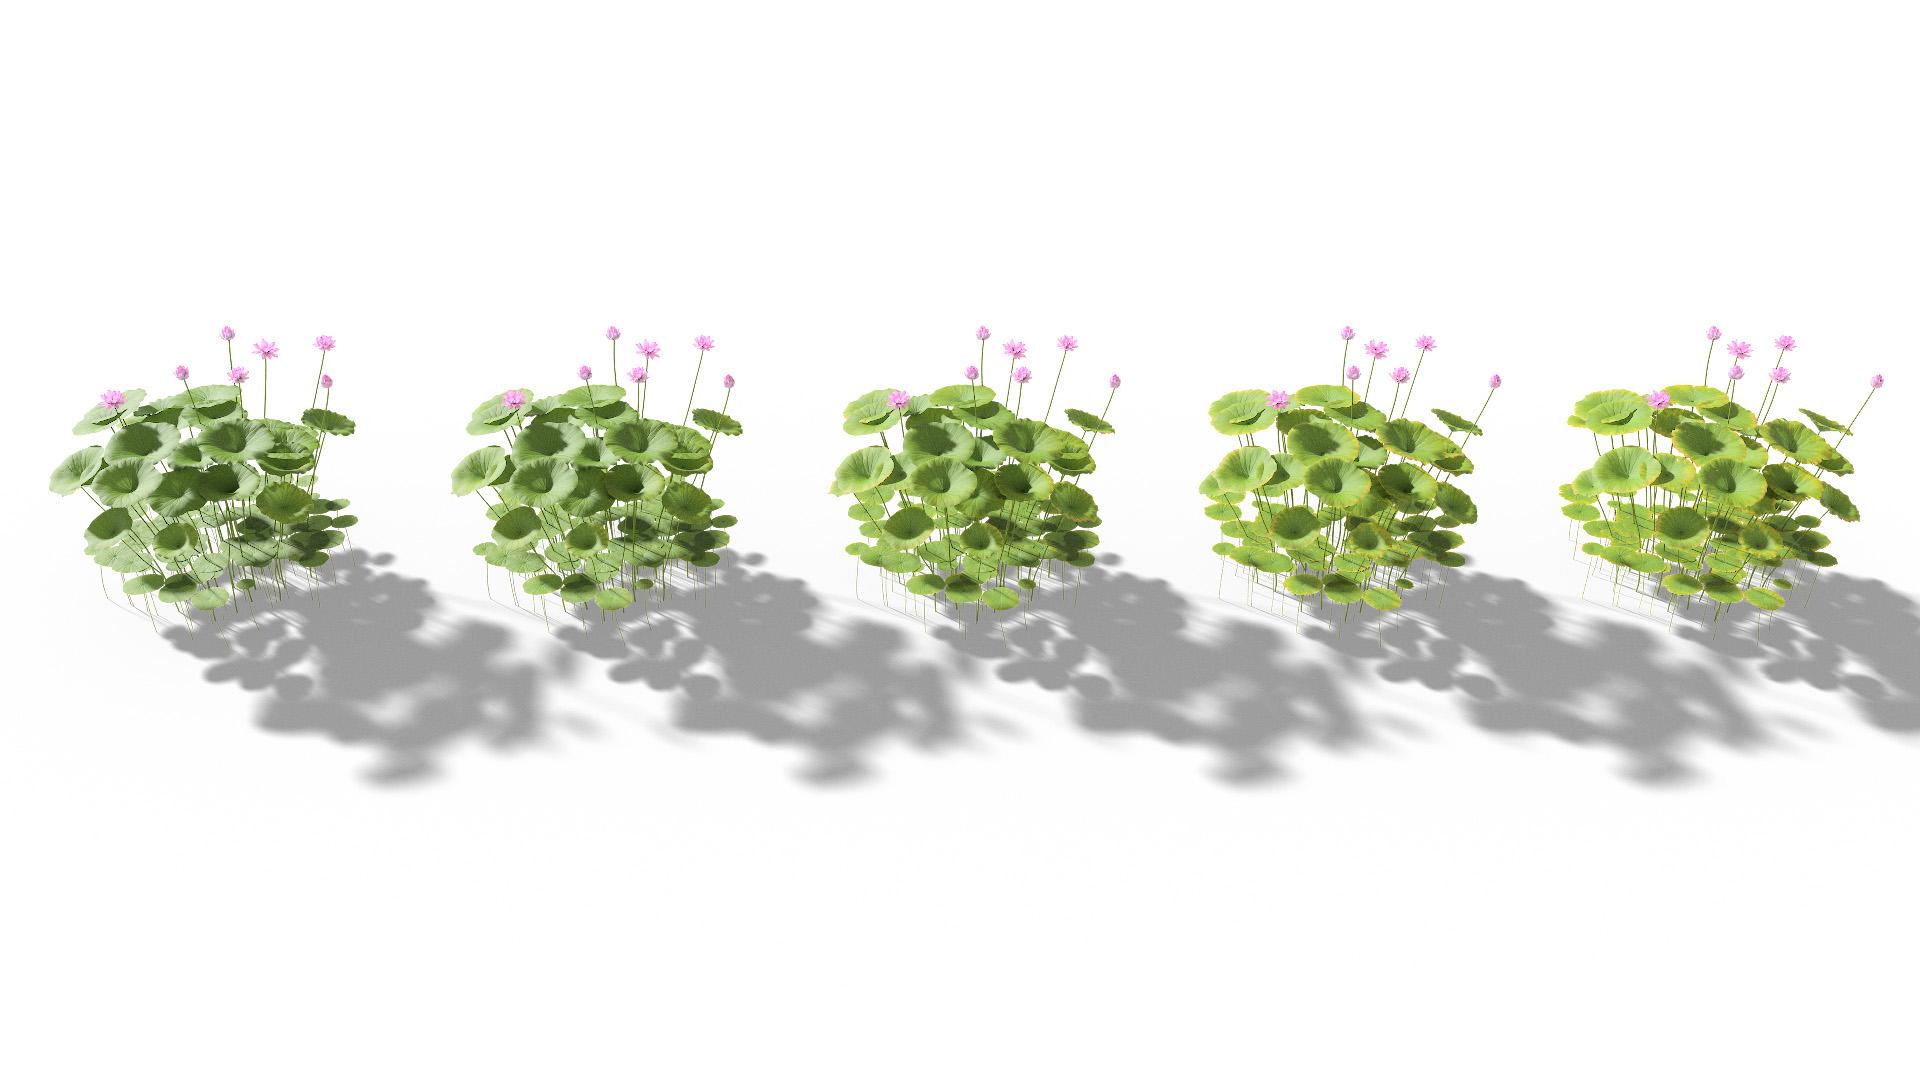 3D model of the Sacred lotus Nelumbo nucifera health variations